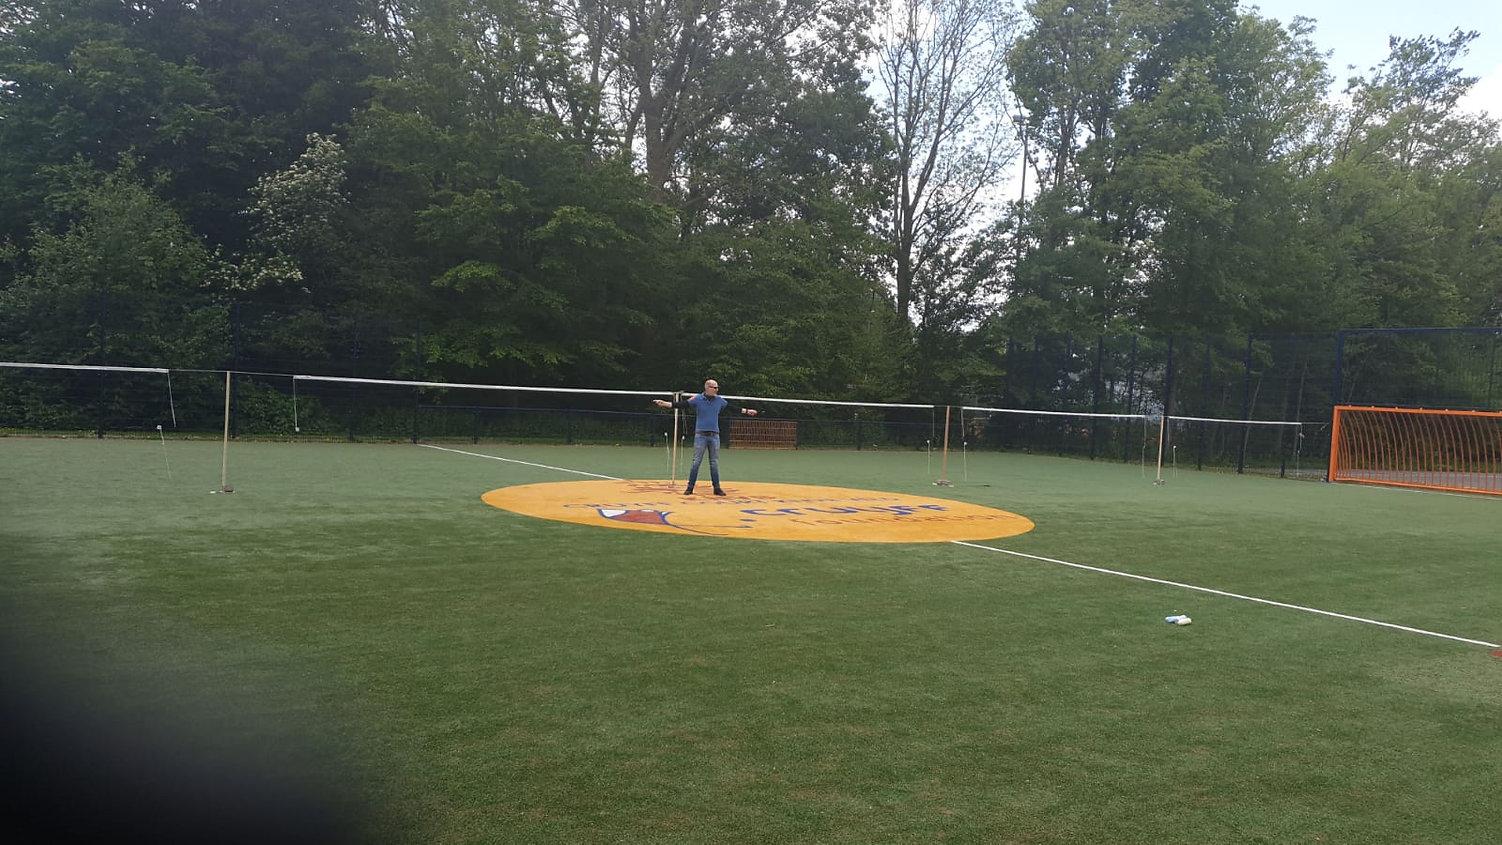 badminton Cruyf Court 17052020.jpeg